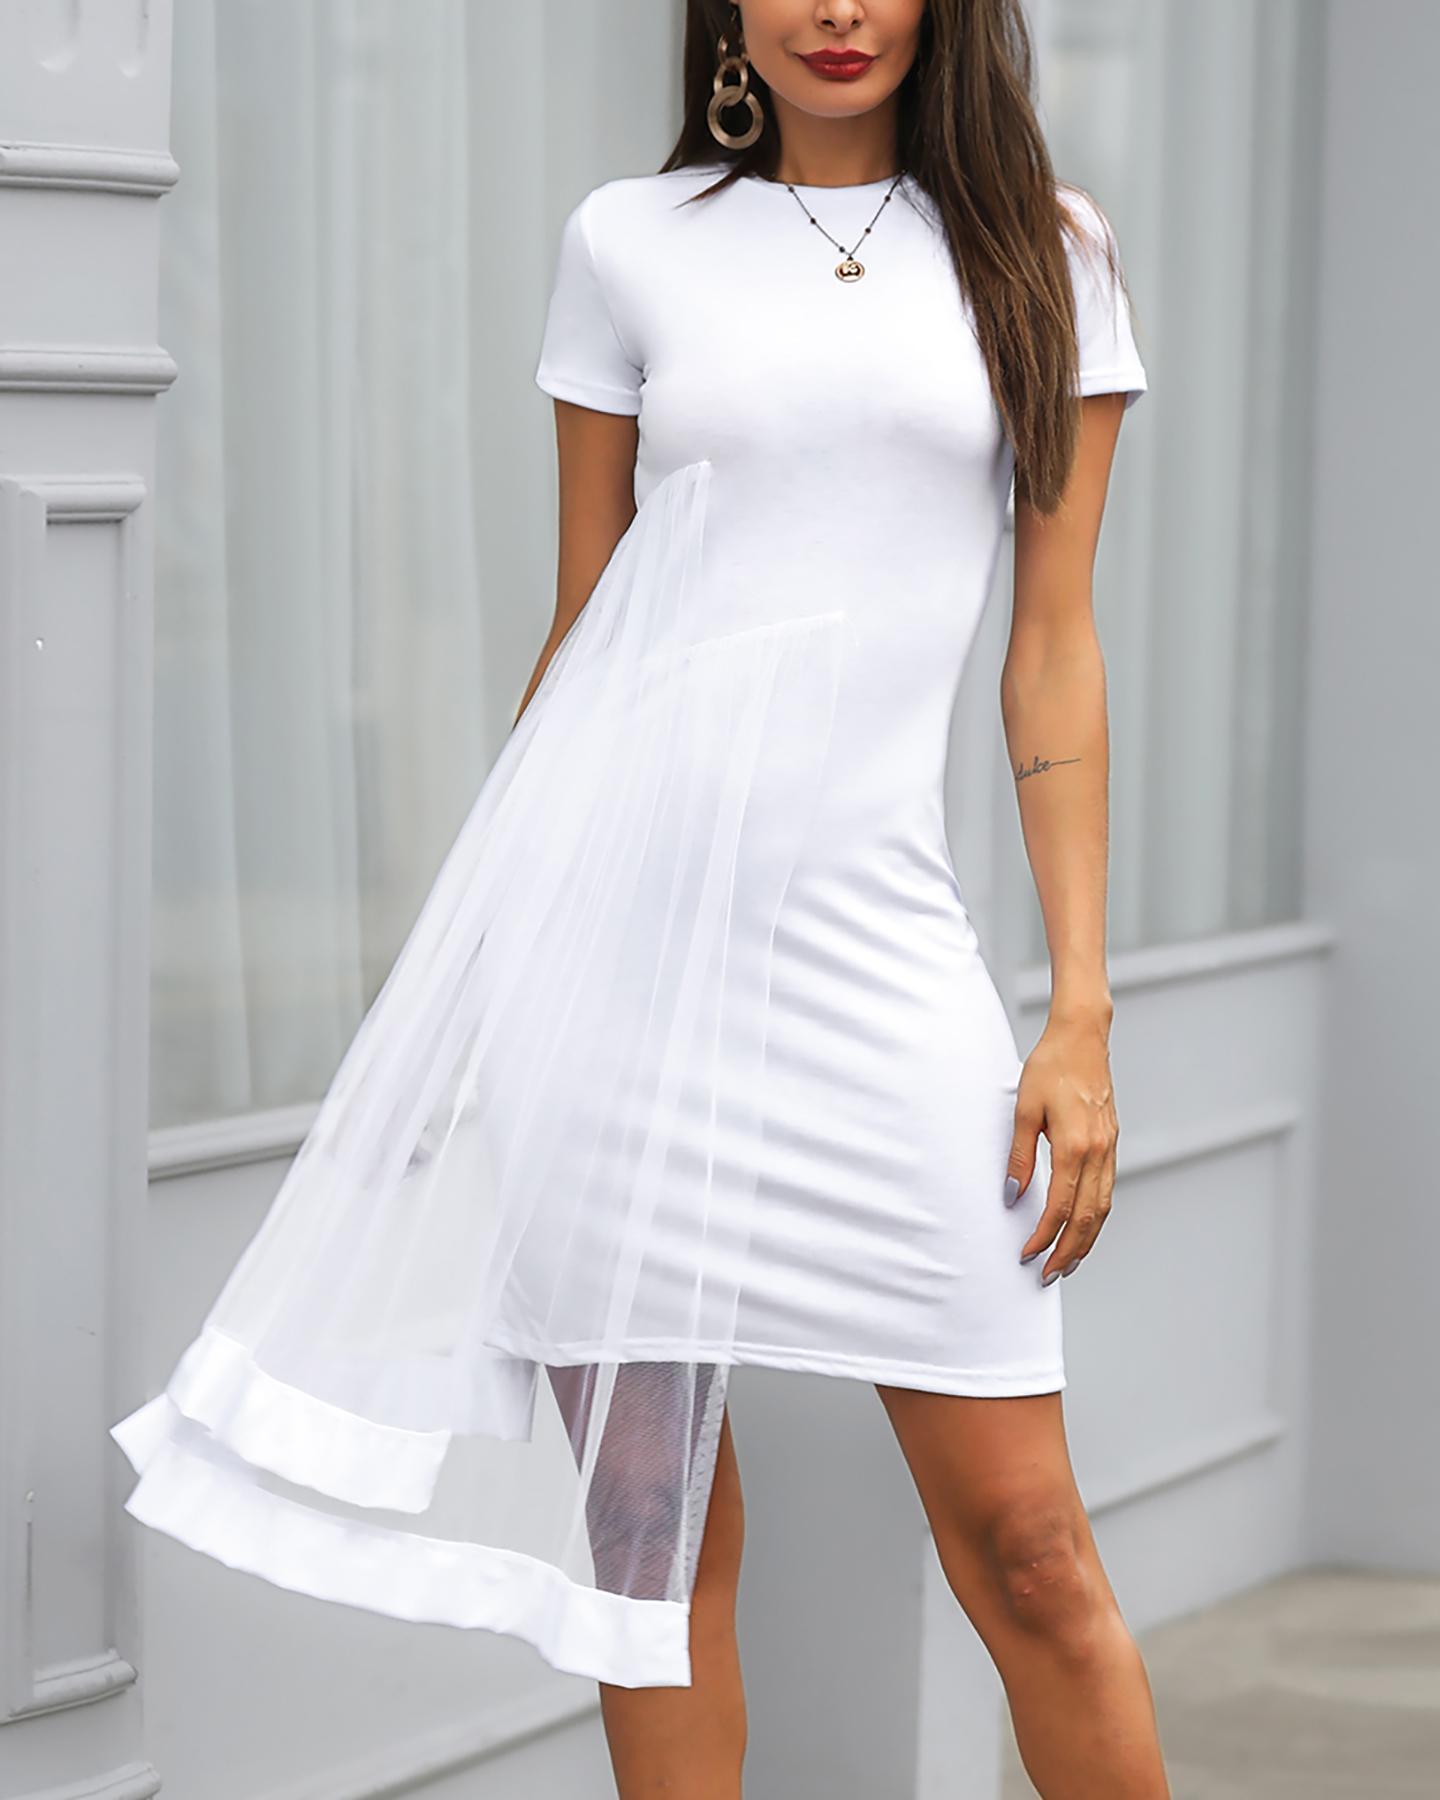 Short Sleeve Layered Mesh Design Dress фото